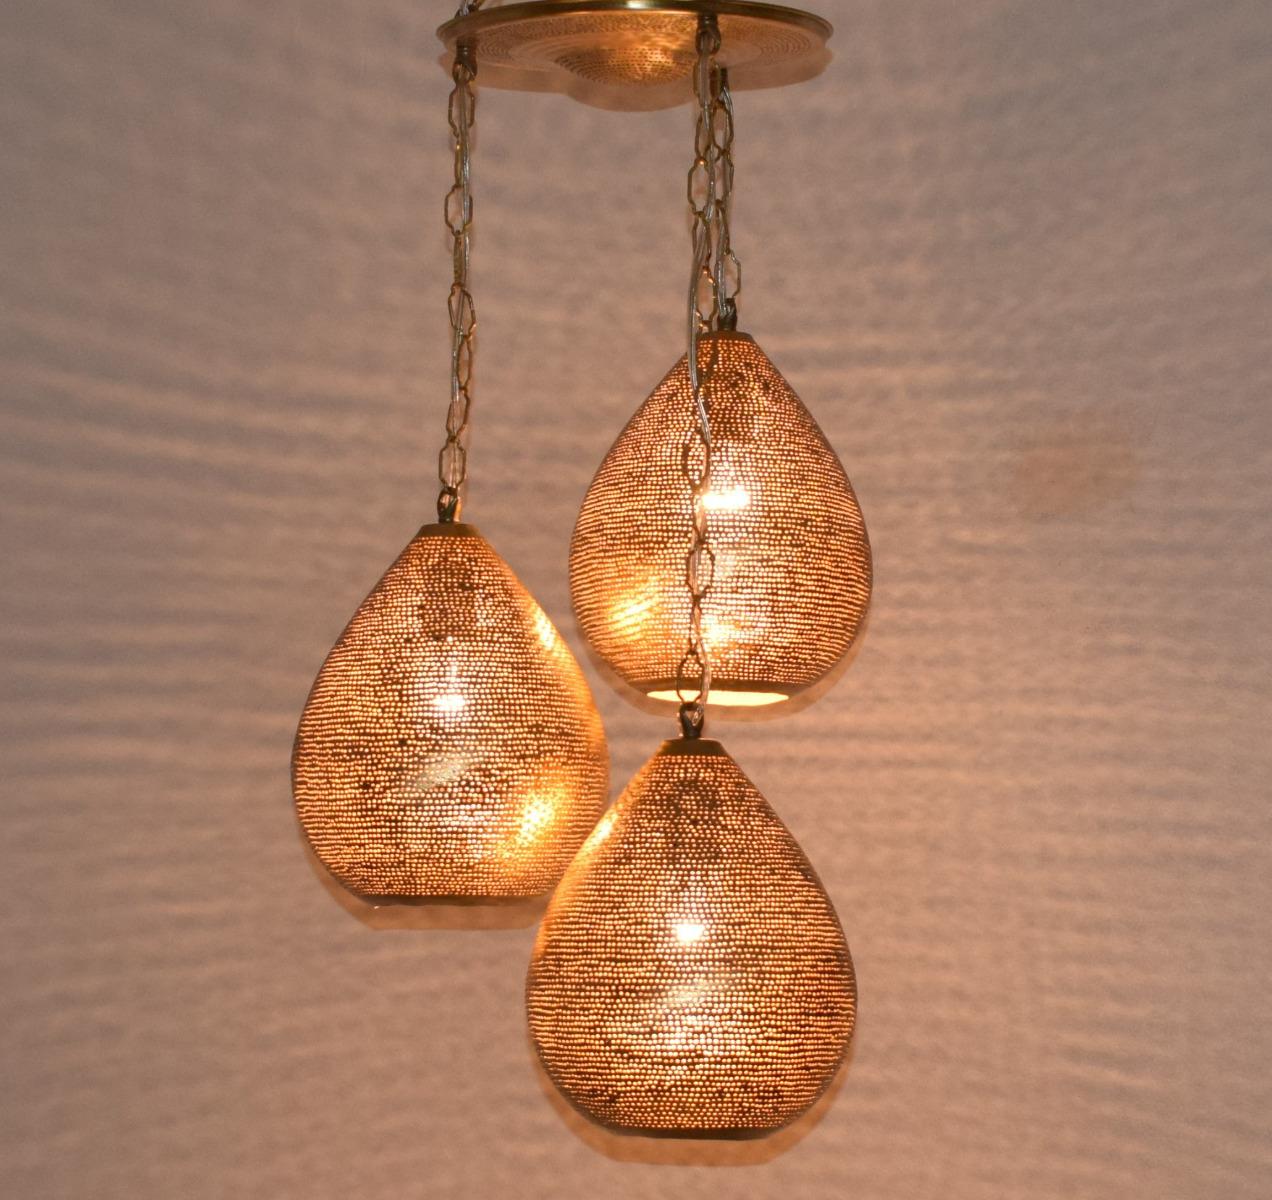 Moroccan 3 In 1 Hanging Pendant Lamps Lighting Ceiling Light Chandelier Ebay